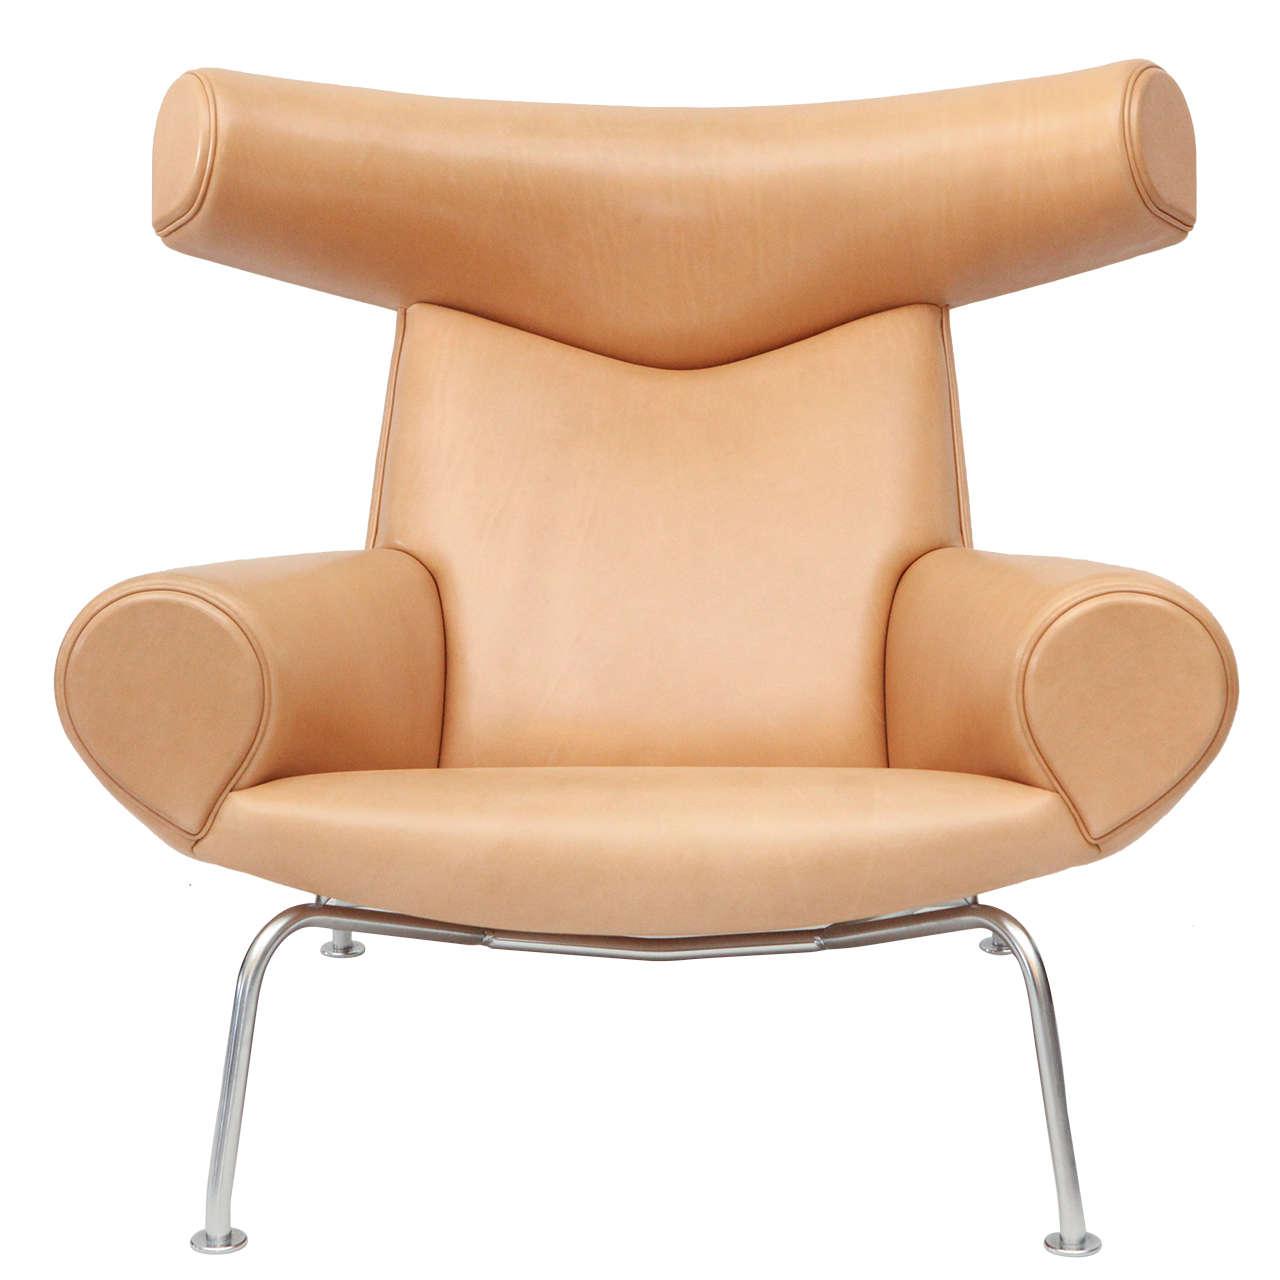 hans wegner ox chair at 1stdibs. Black Bedroom Furniture Sets. Home Design Ideas